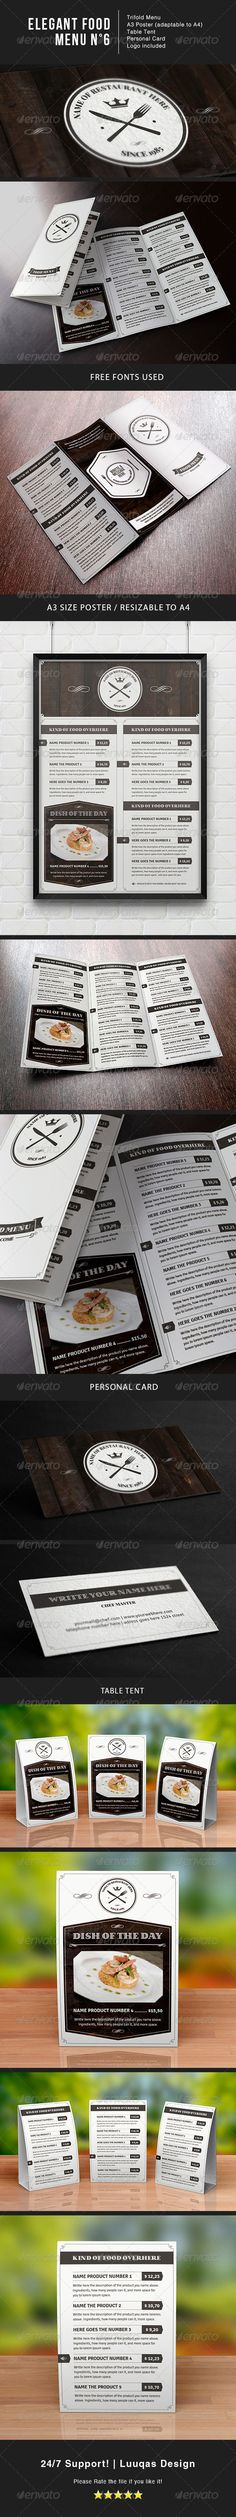 Elegant Food Menu 6  #GraphicRiver         Elegant food menu template for your restaurant.